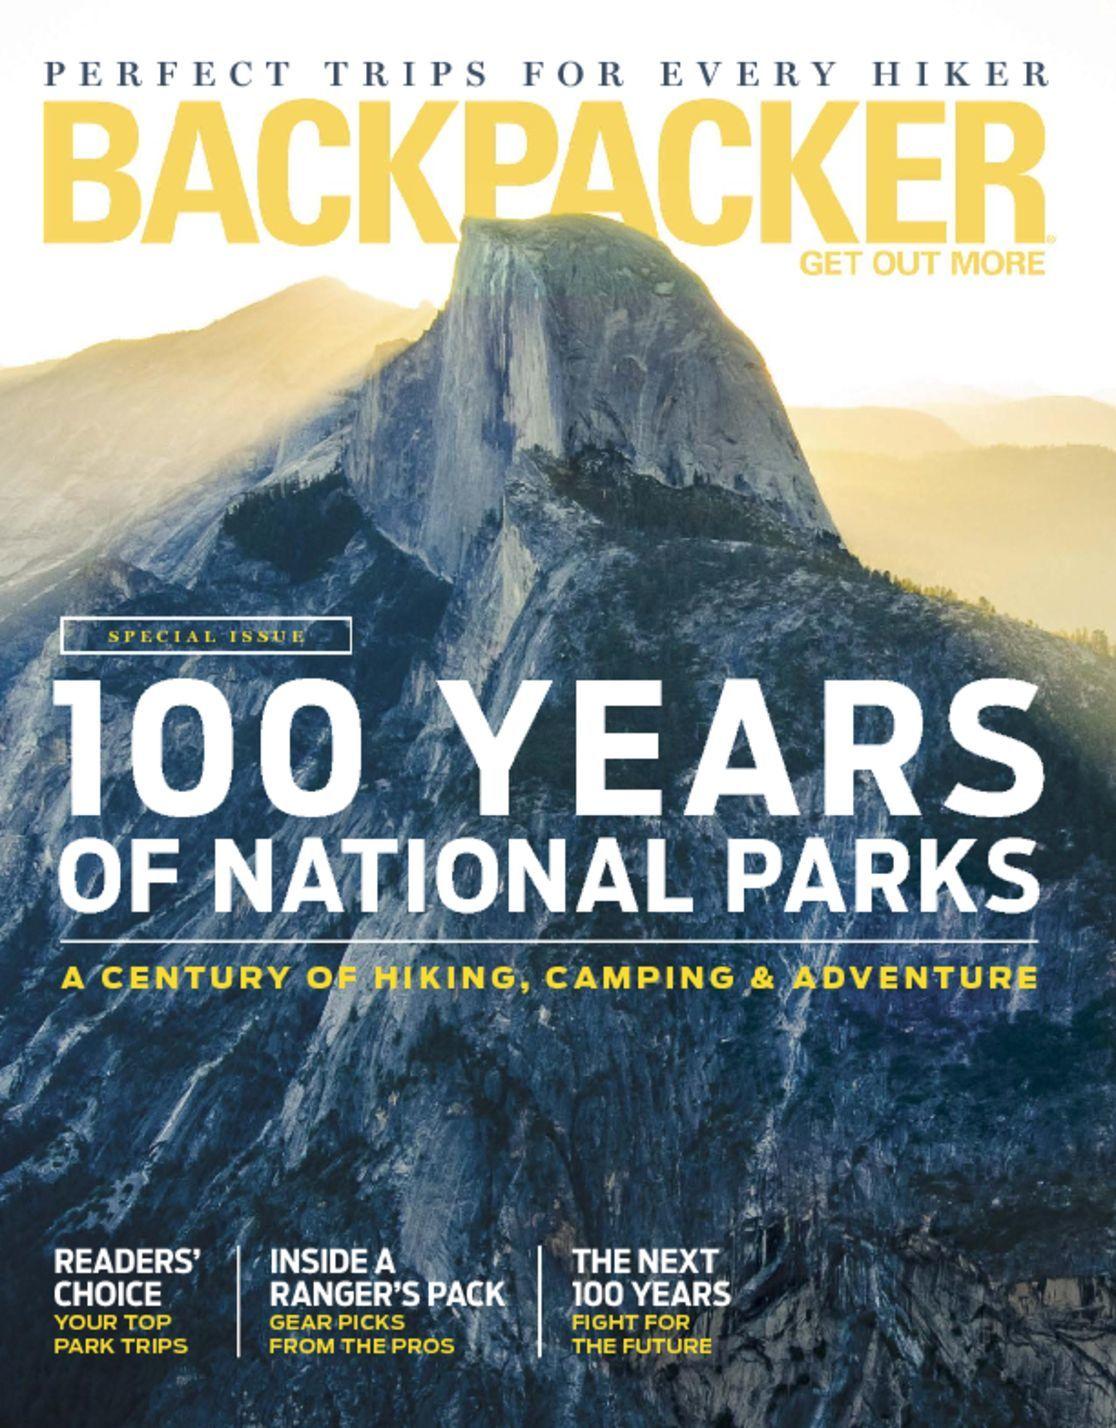 Backpacker $4.99/yr, Outside $4.99/yr, Climbing $5.99/yr